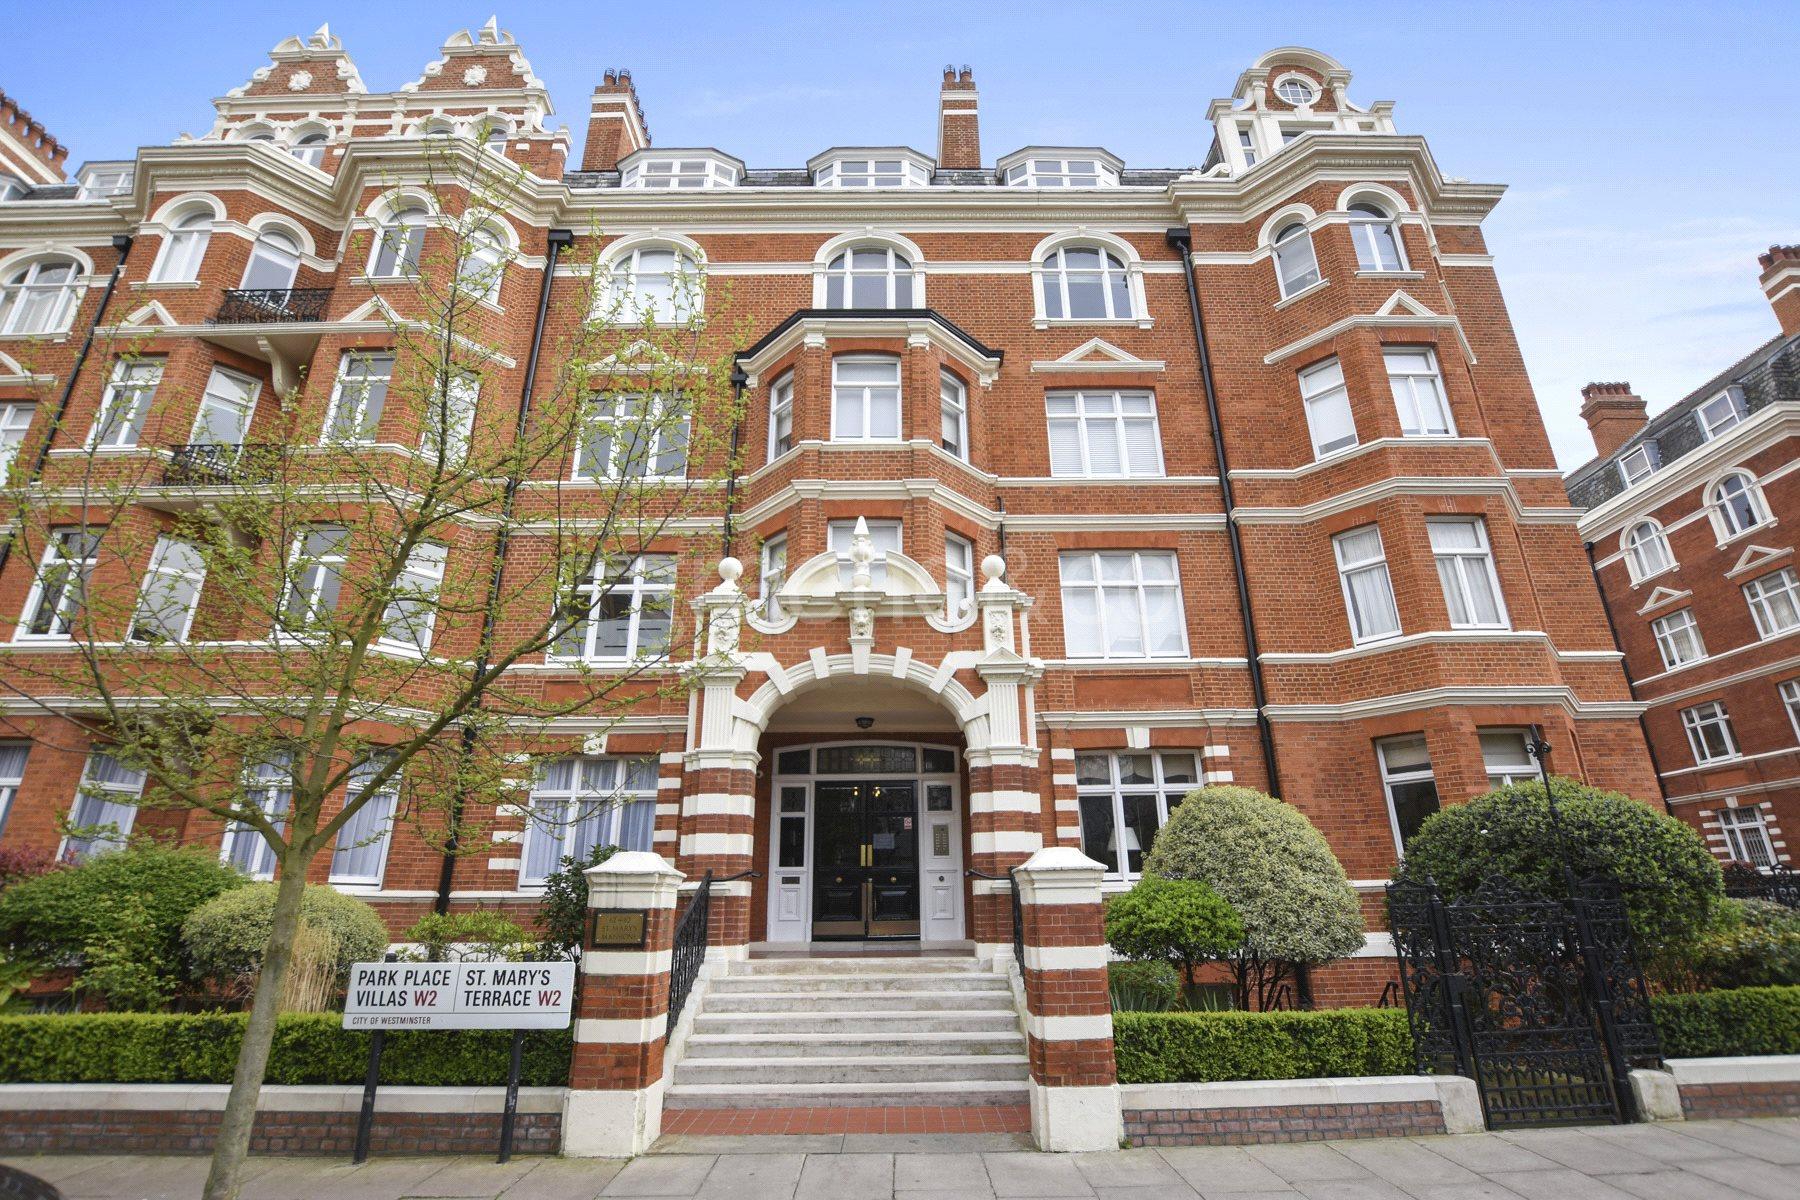 4 Bedrooms Flat for sale in St Marys Mansions, St. Marys Terrace, London, W2